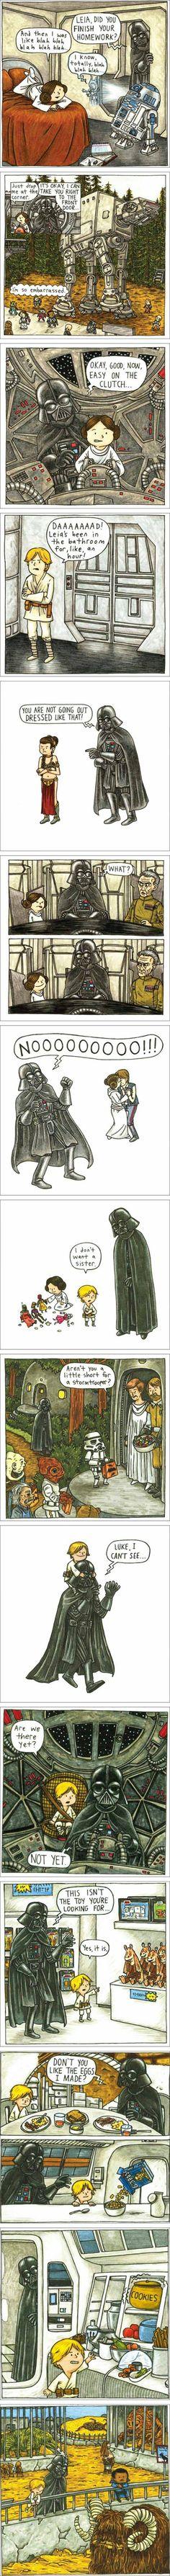 Vader dad 2.0 - www.viralpx.com